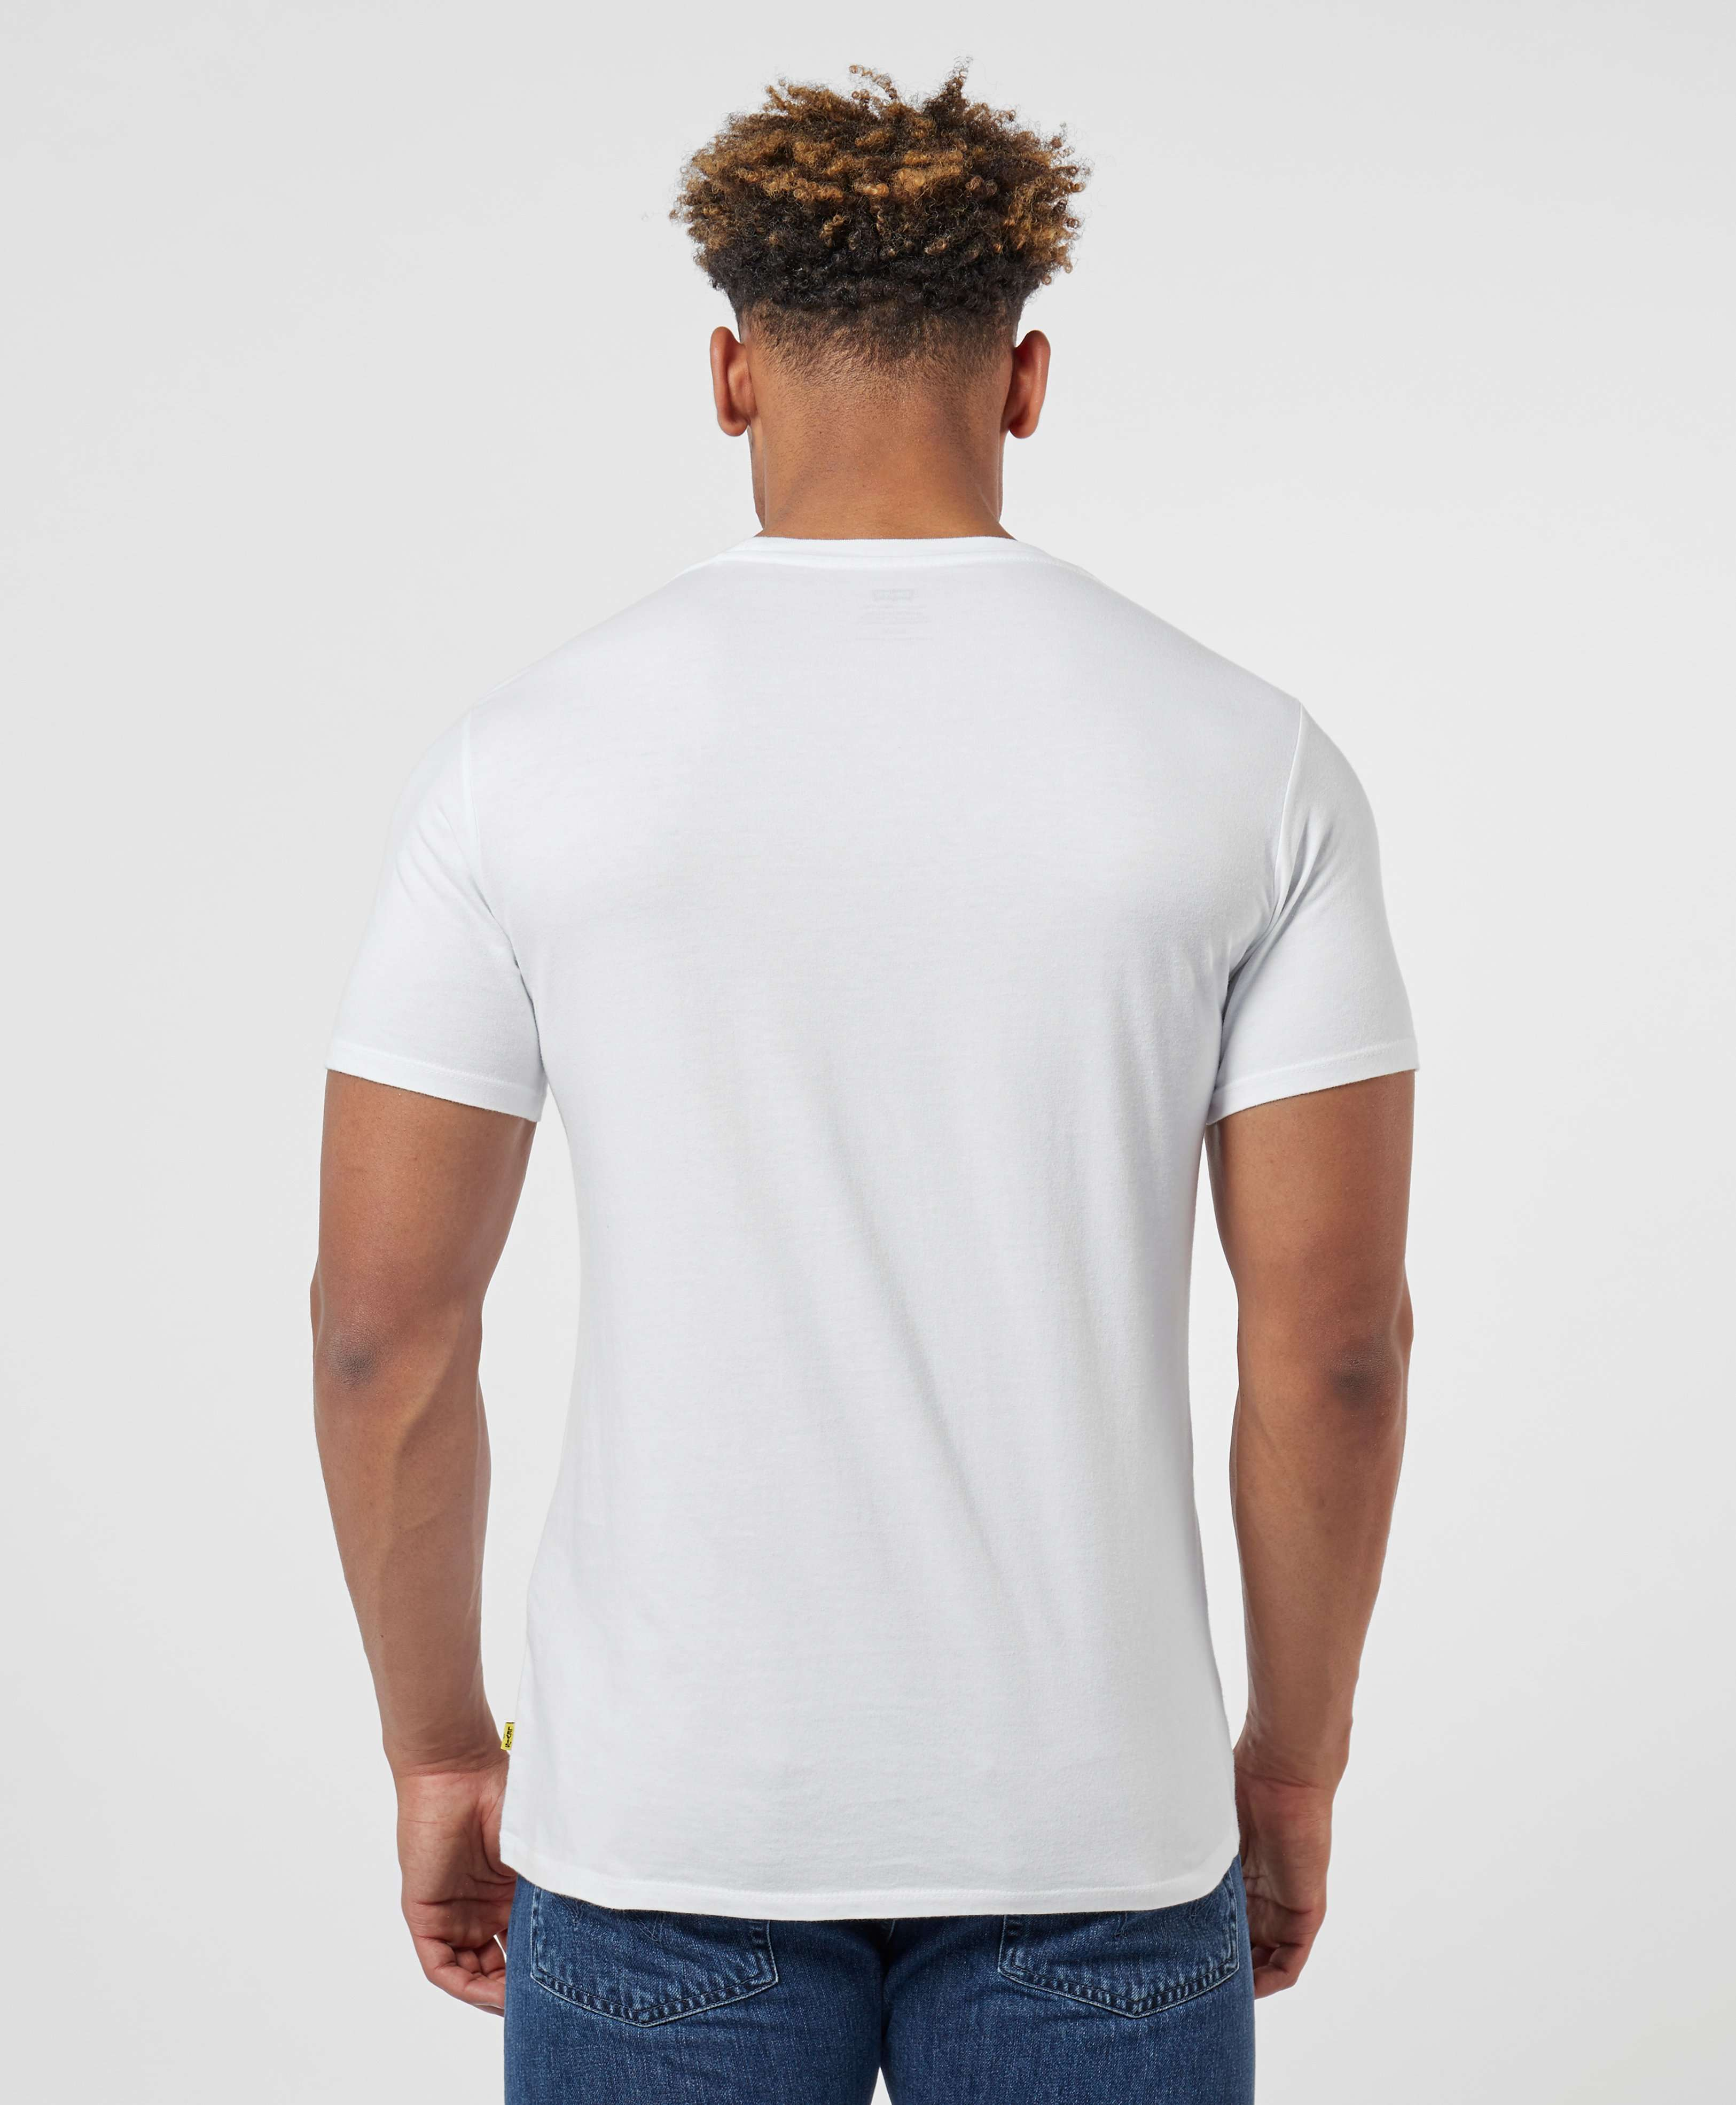 Levis x Peanuts Snoopy Logo Short Sleeve T-Shirt